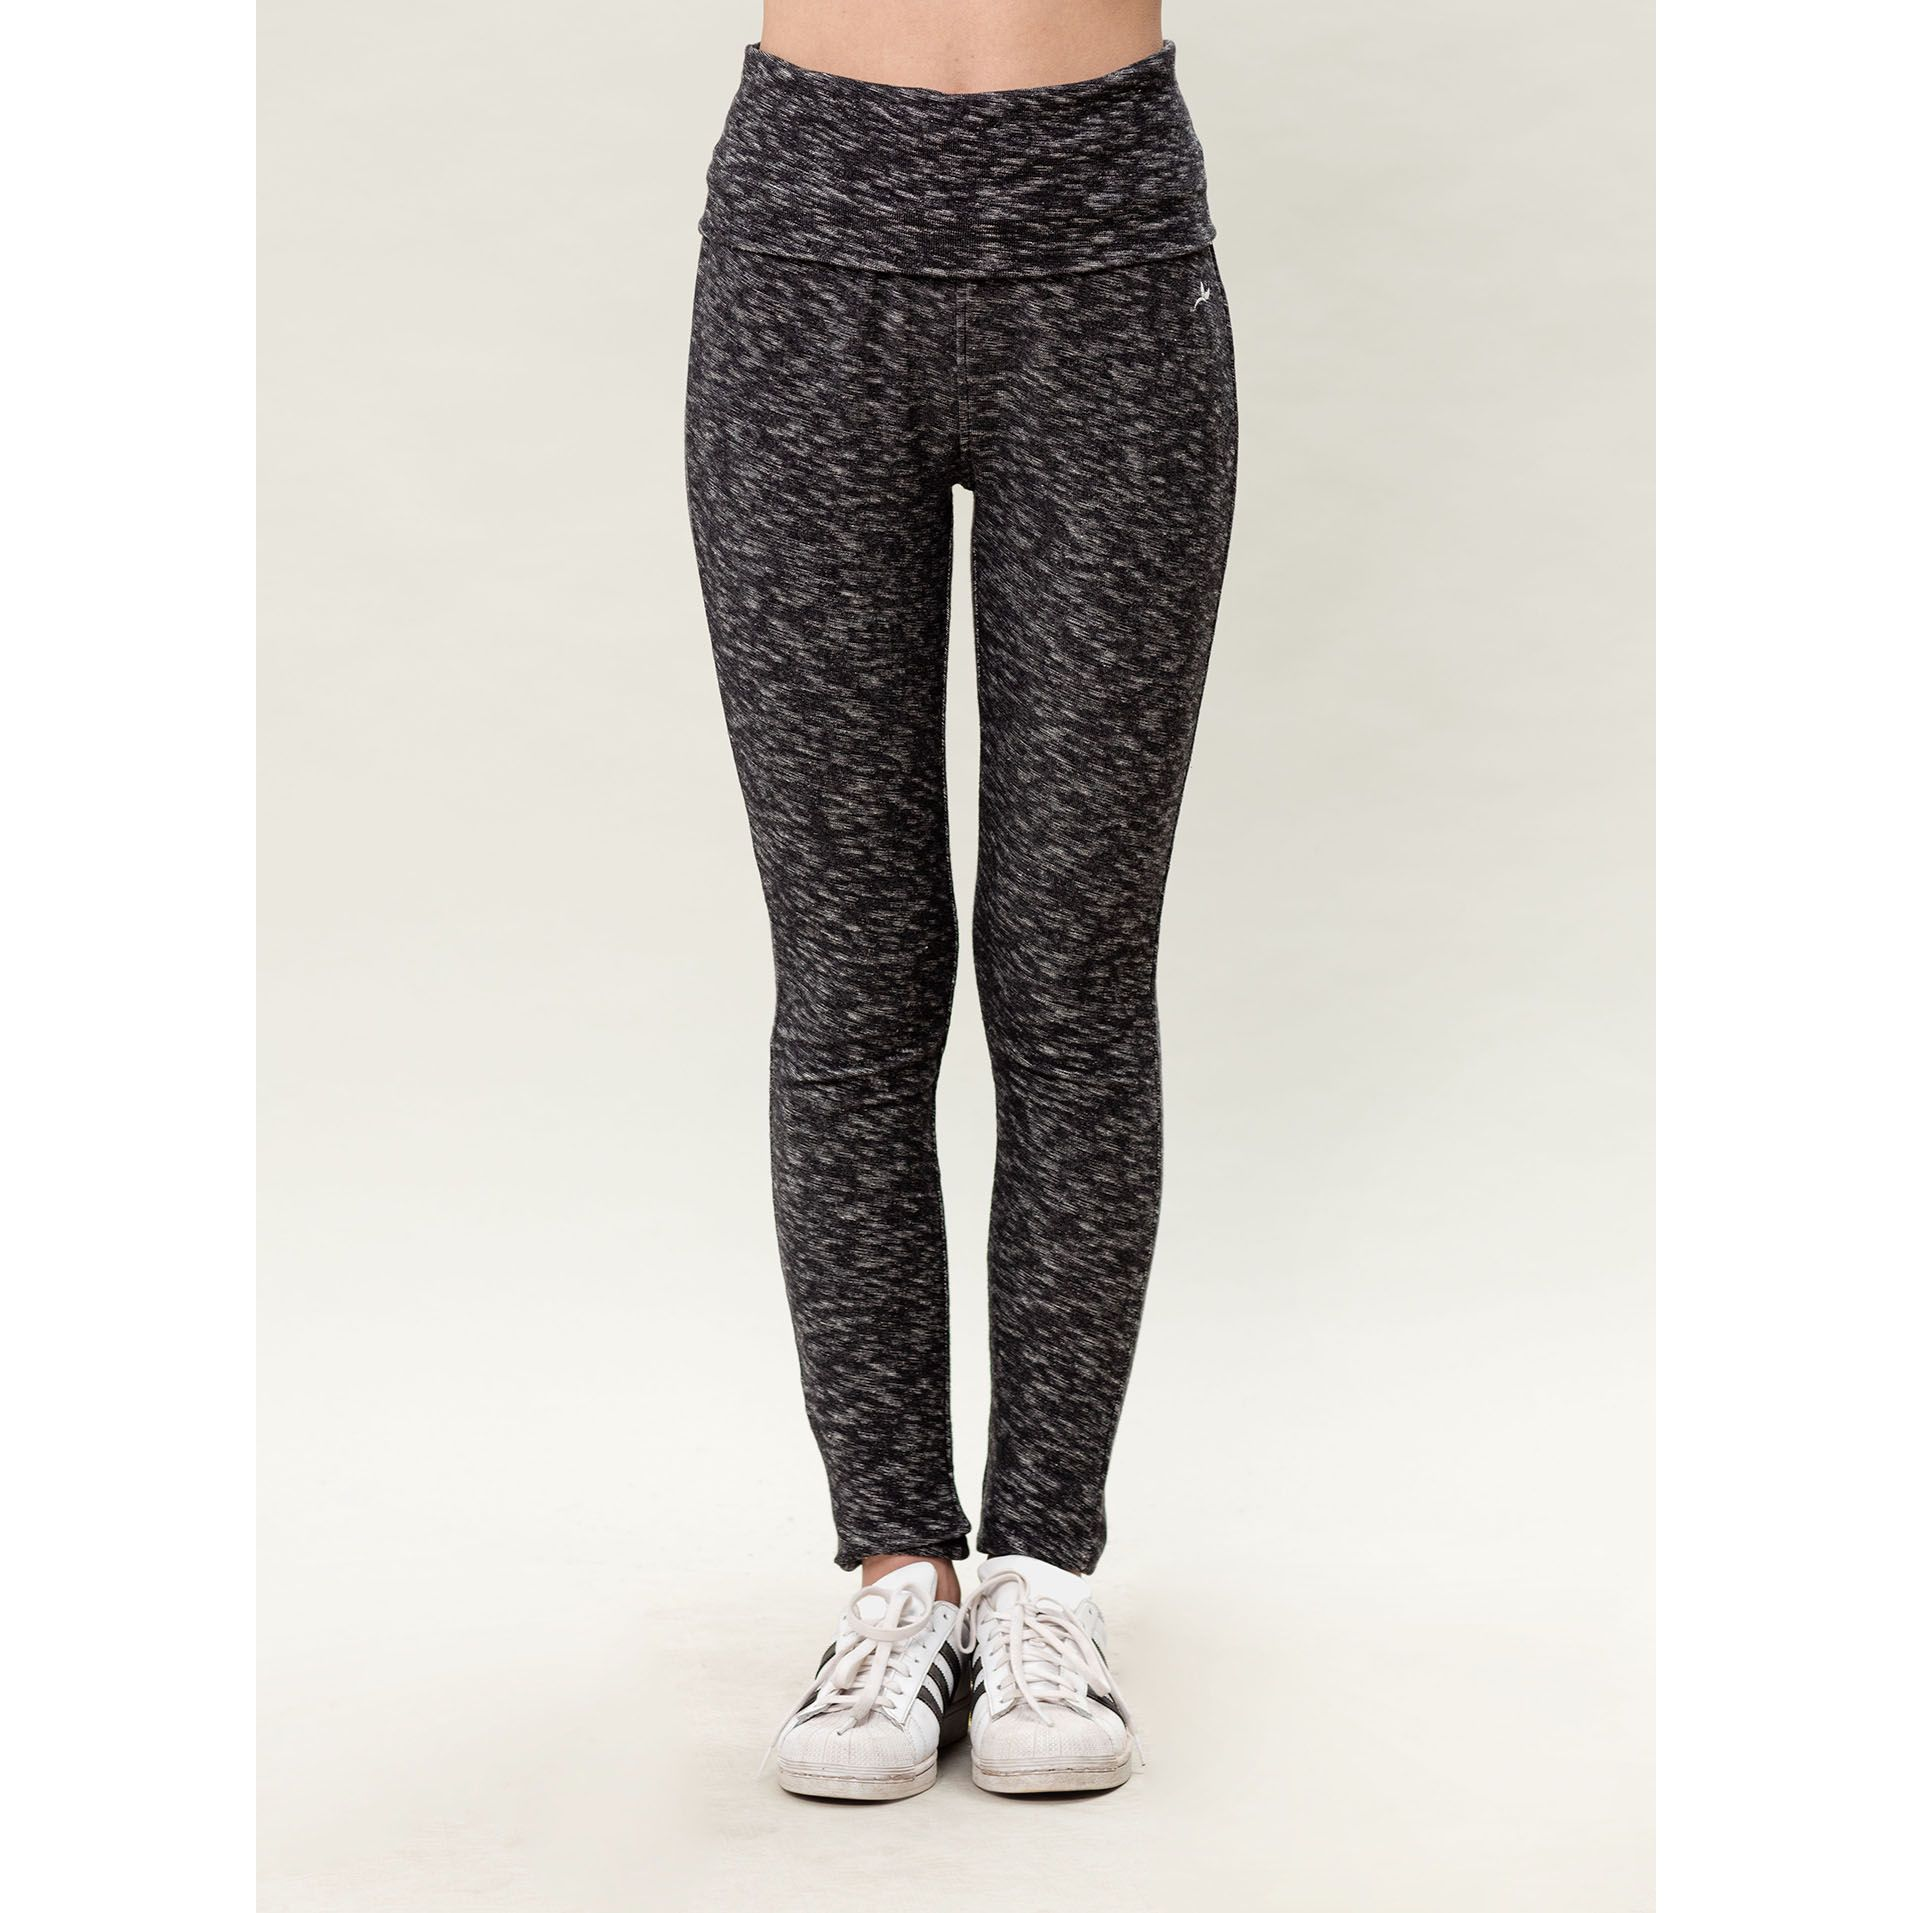 ce53adc529a172 Damenmode :: Sportbekleidung :: Hosen :: Damen Jogginghose - black/grey